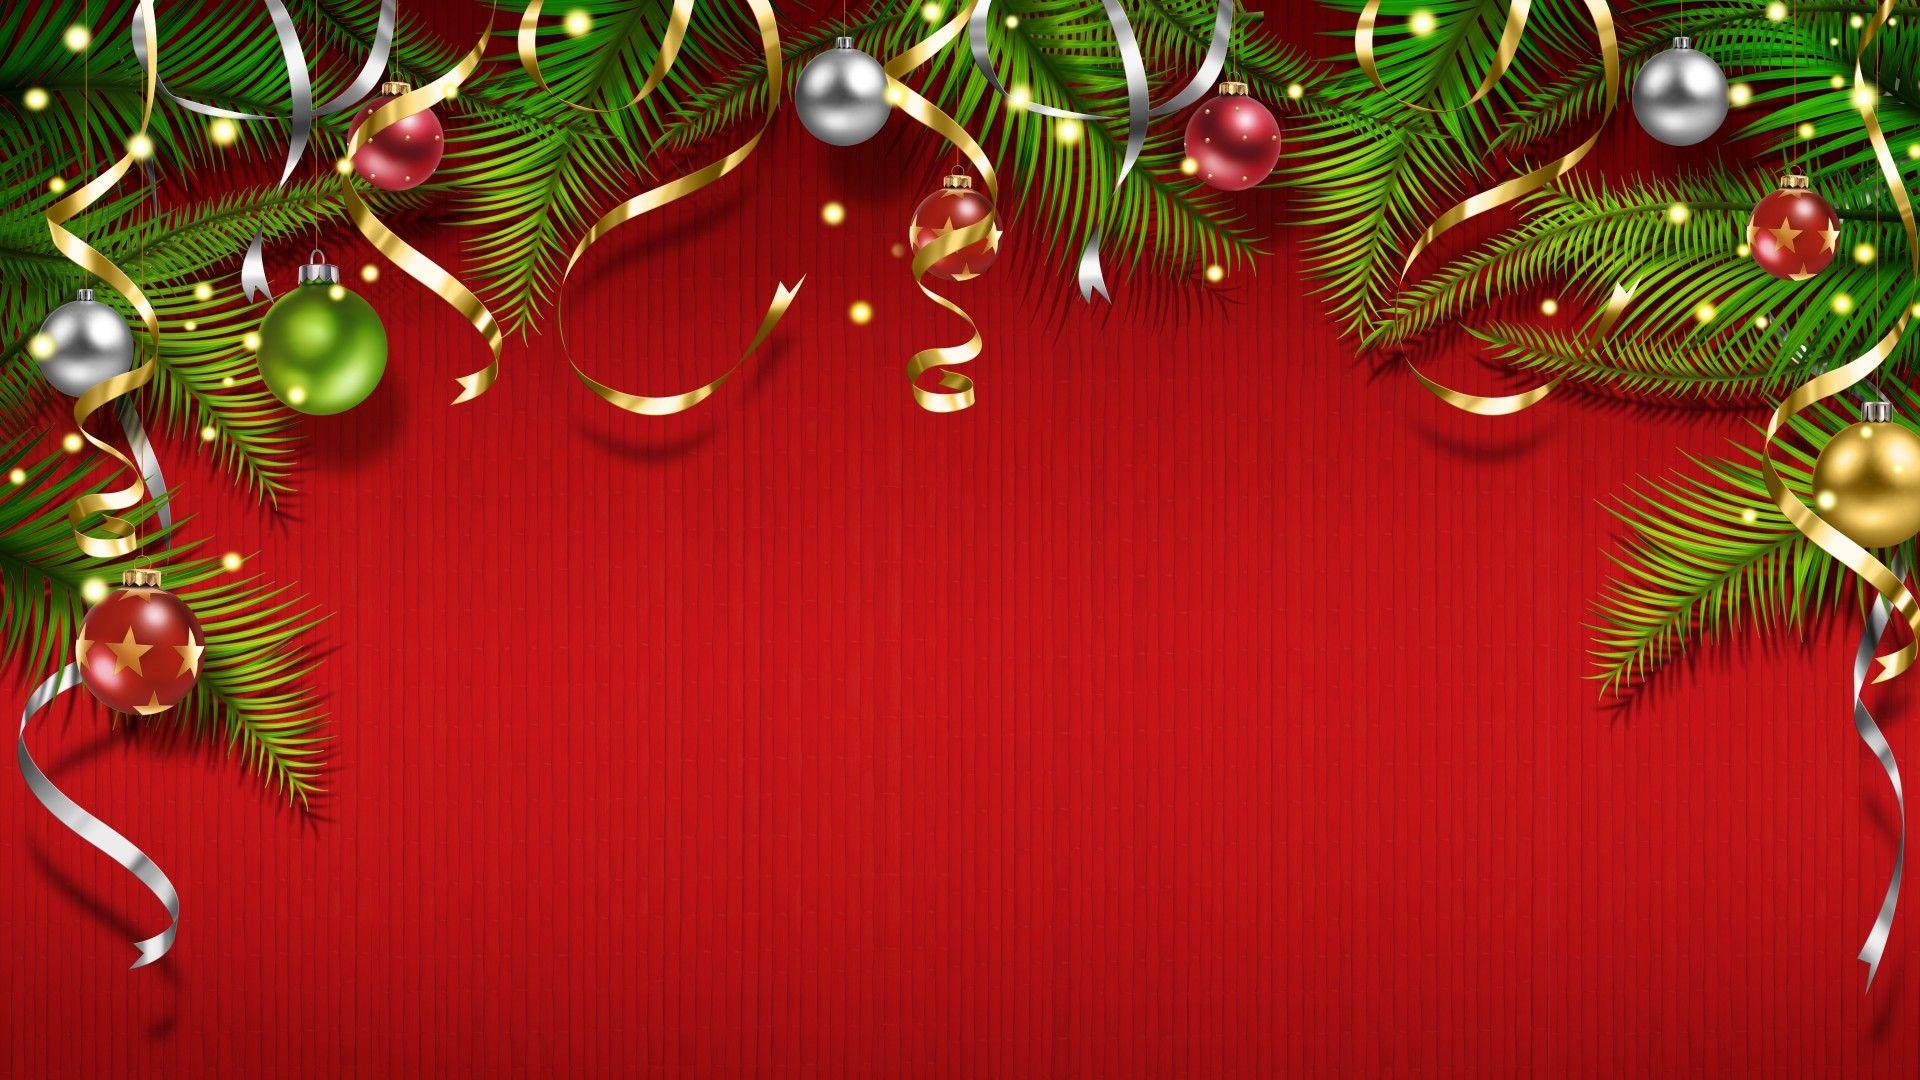 Christmas Wallpaper Hd Desktop Collection